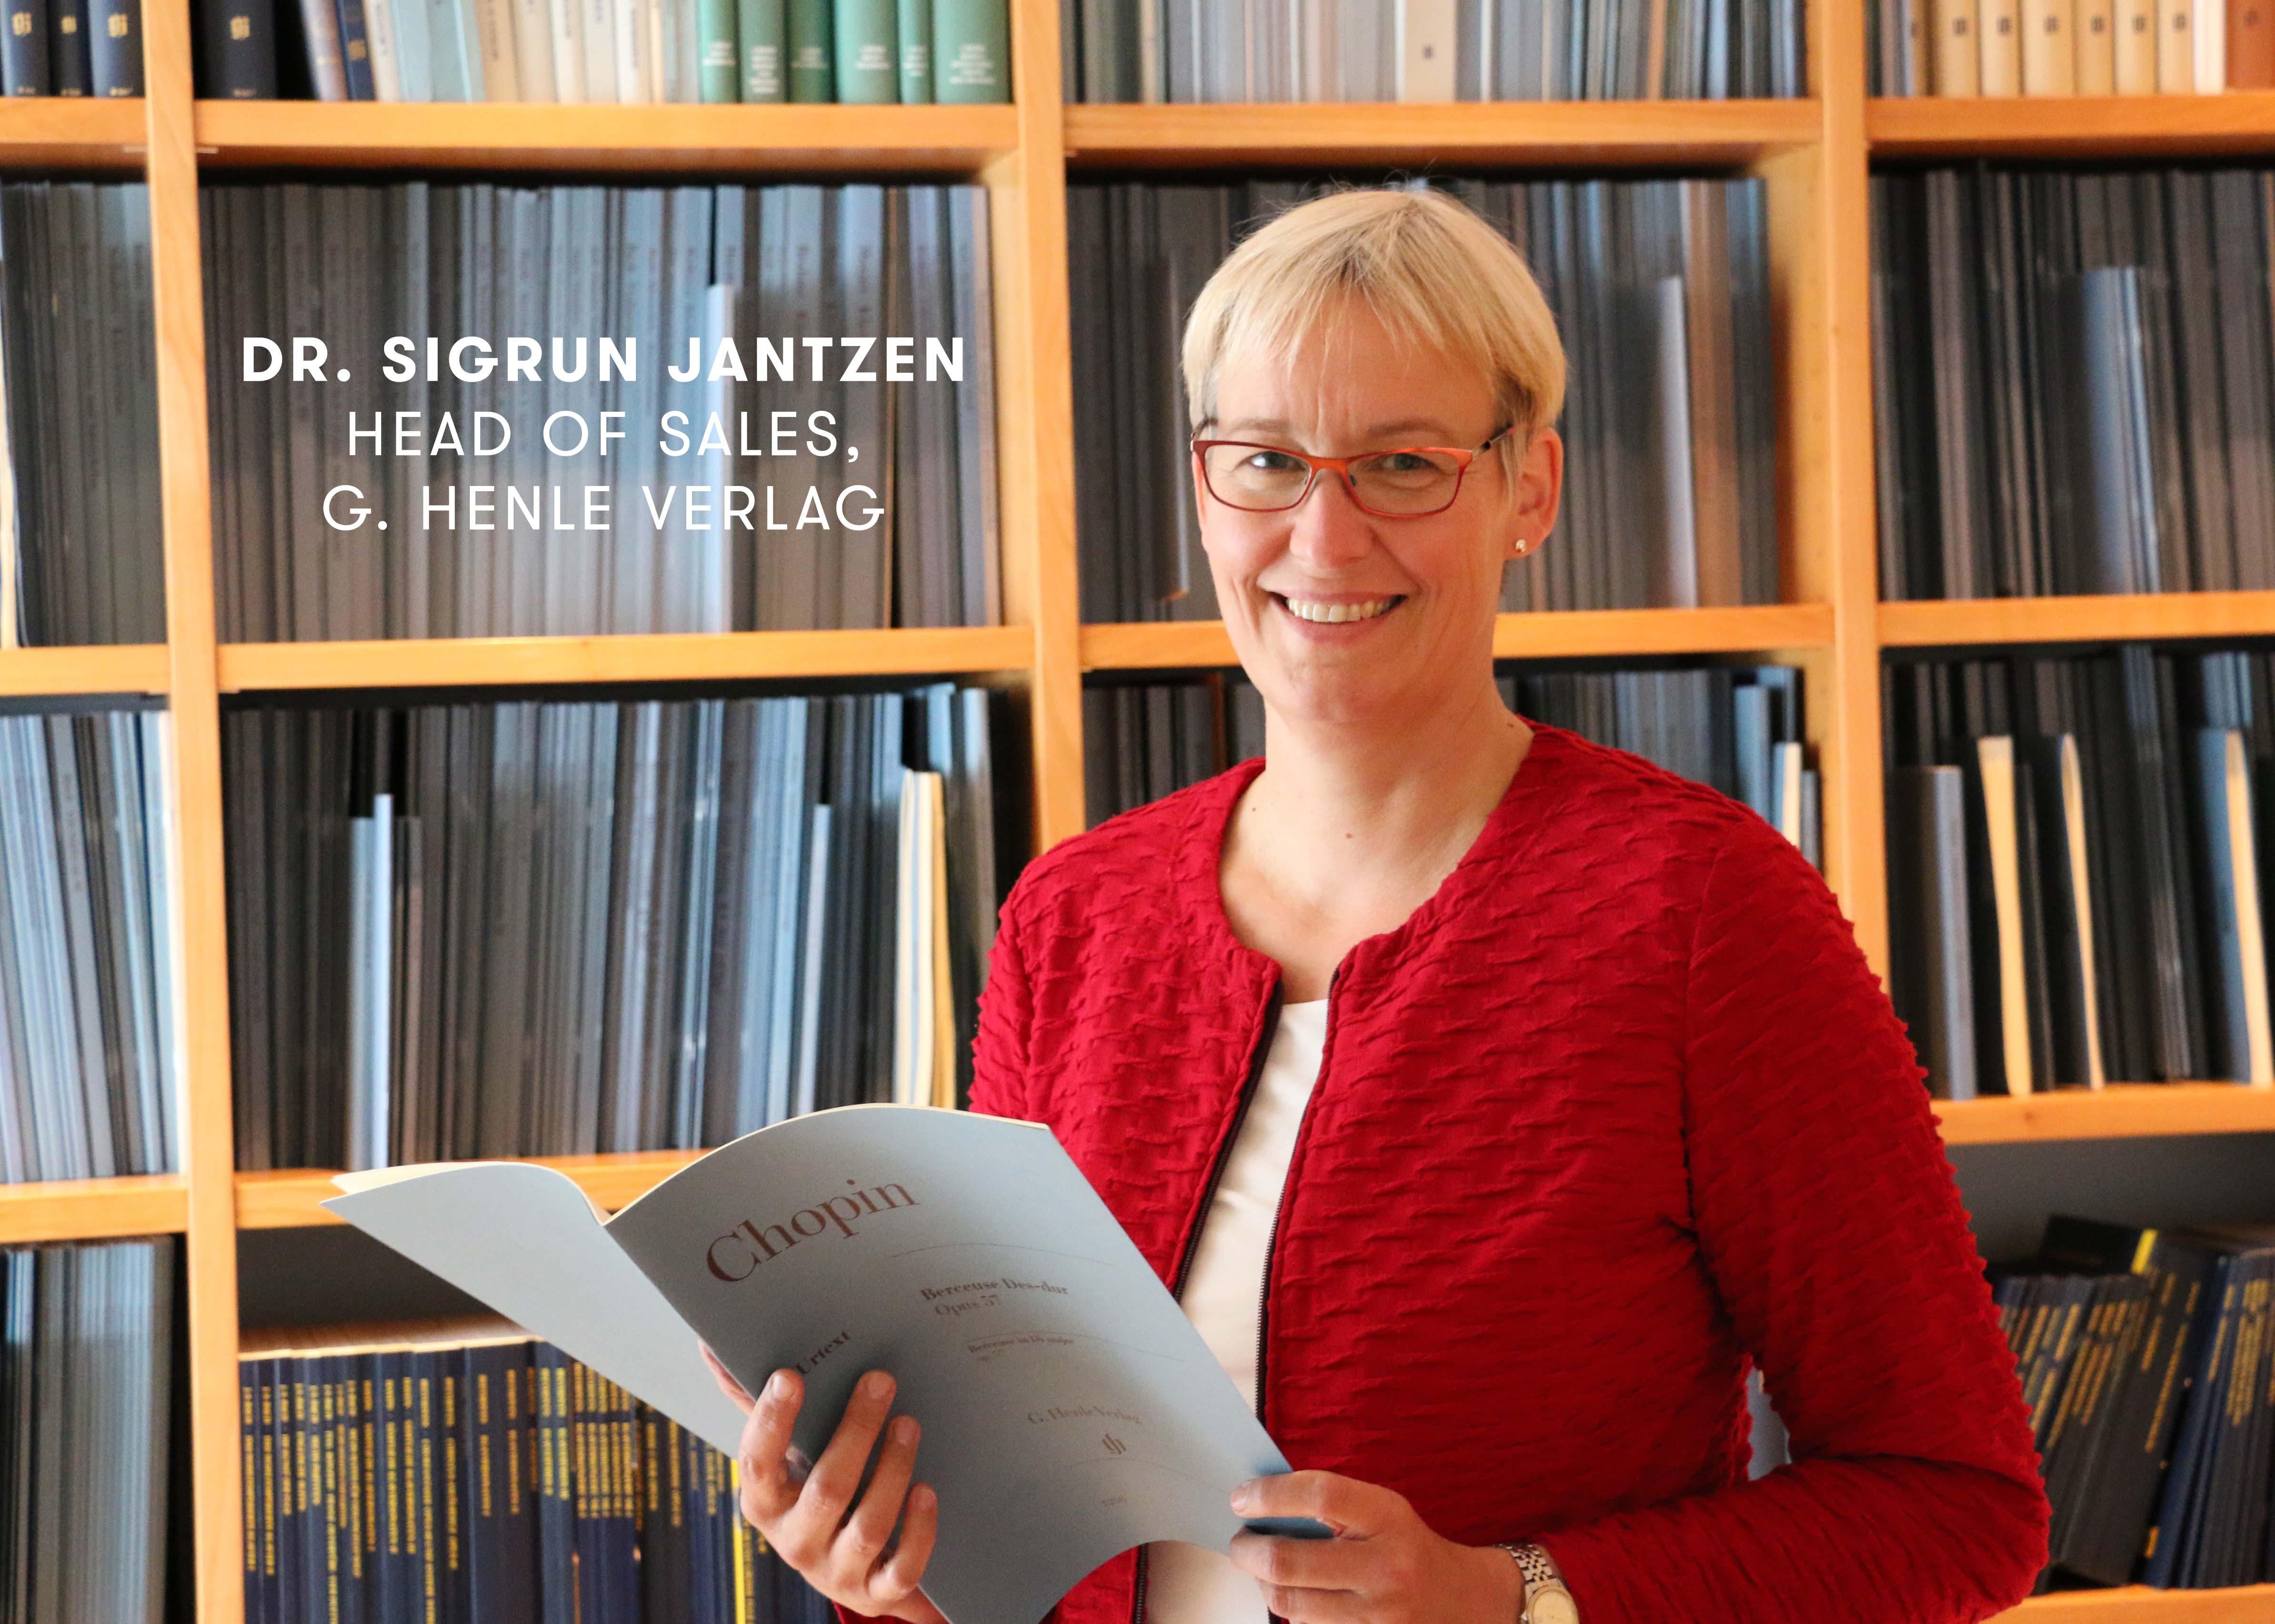 Dr Sigrun Jantzen